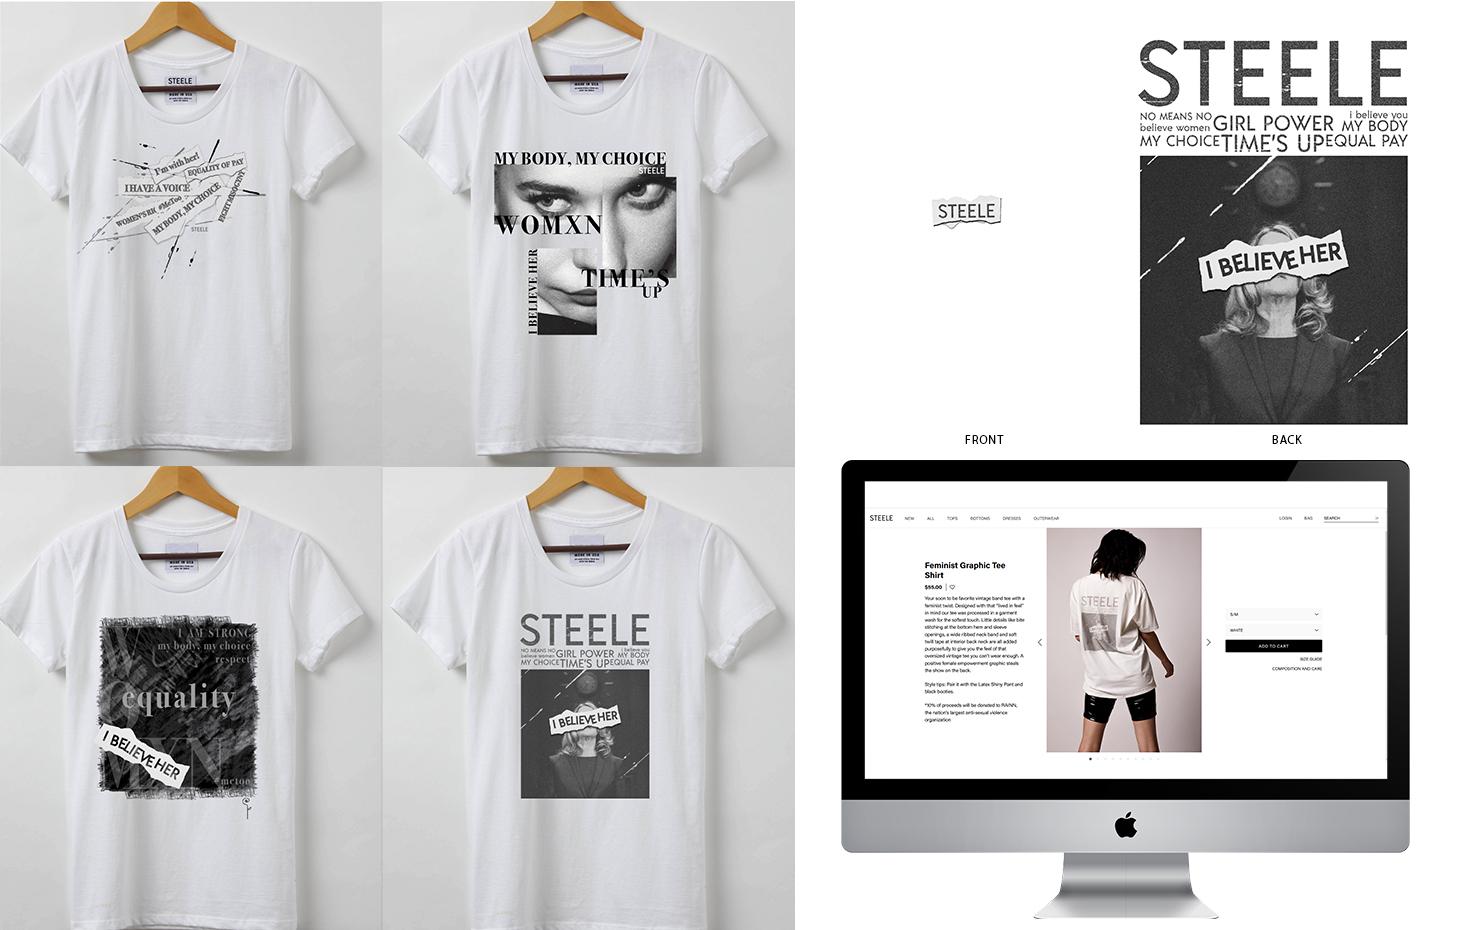 STEELE Graphic T